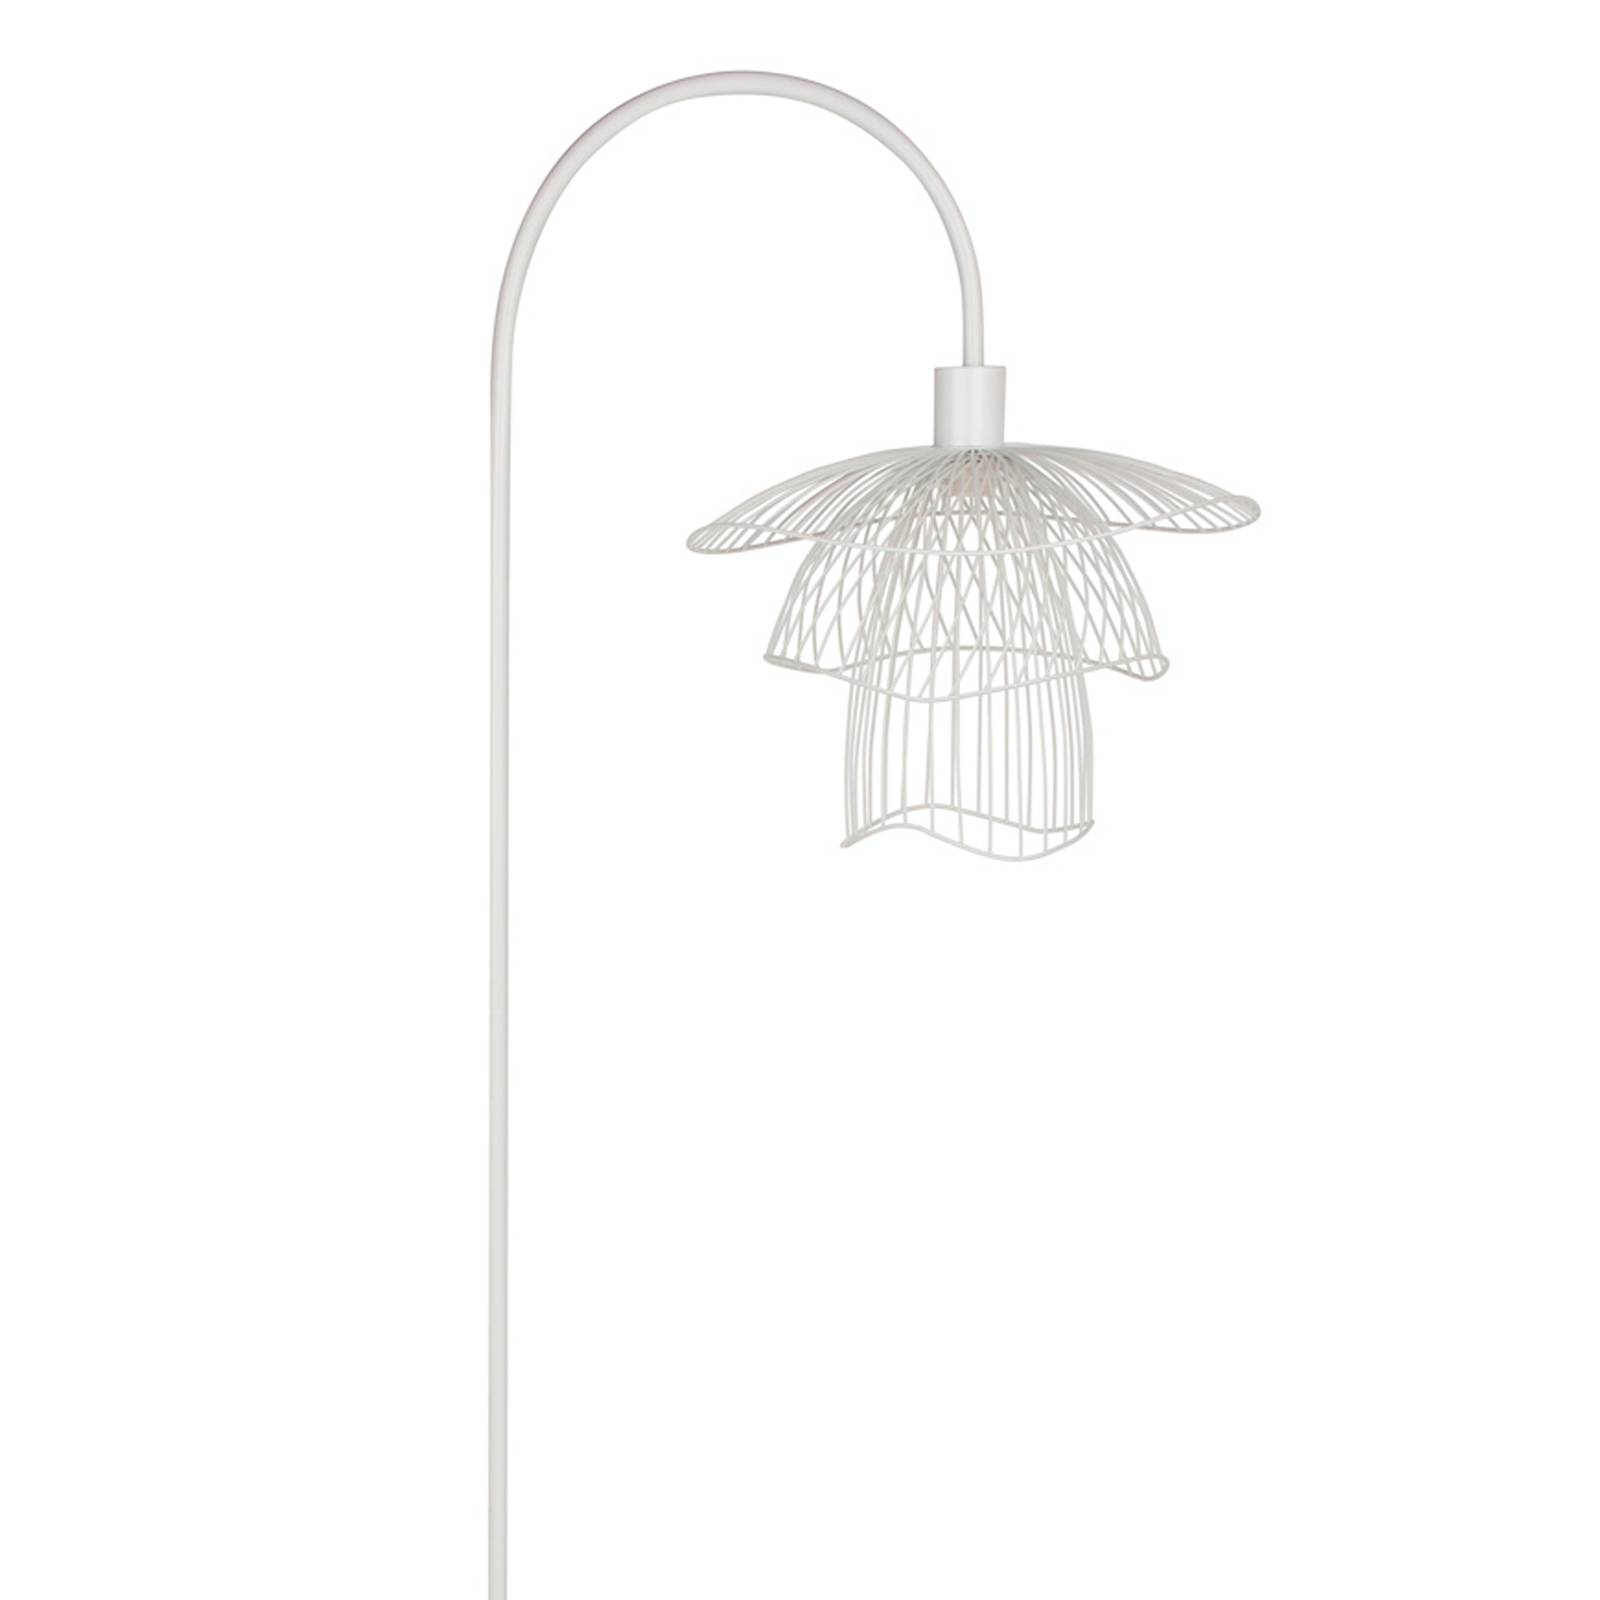 Forestier Papillon XS vloerlamp, wit